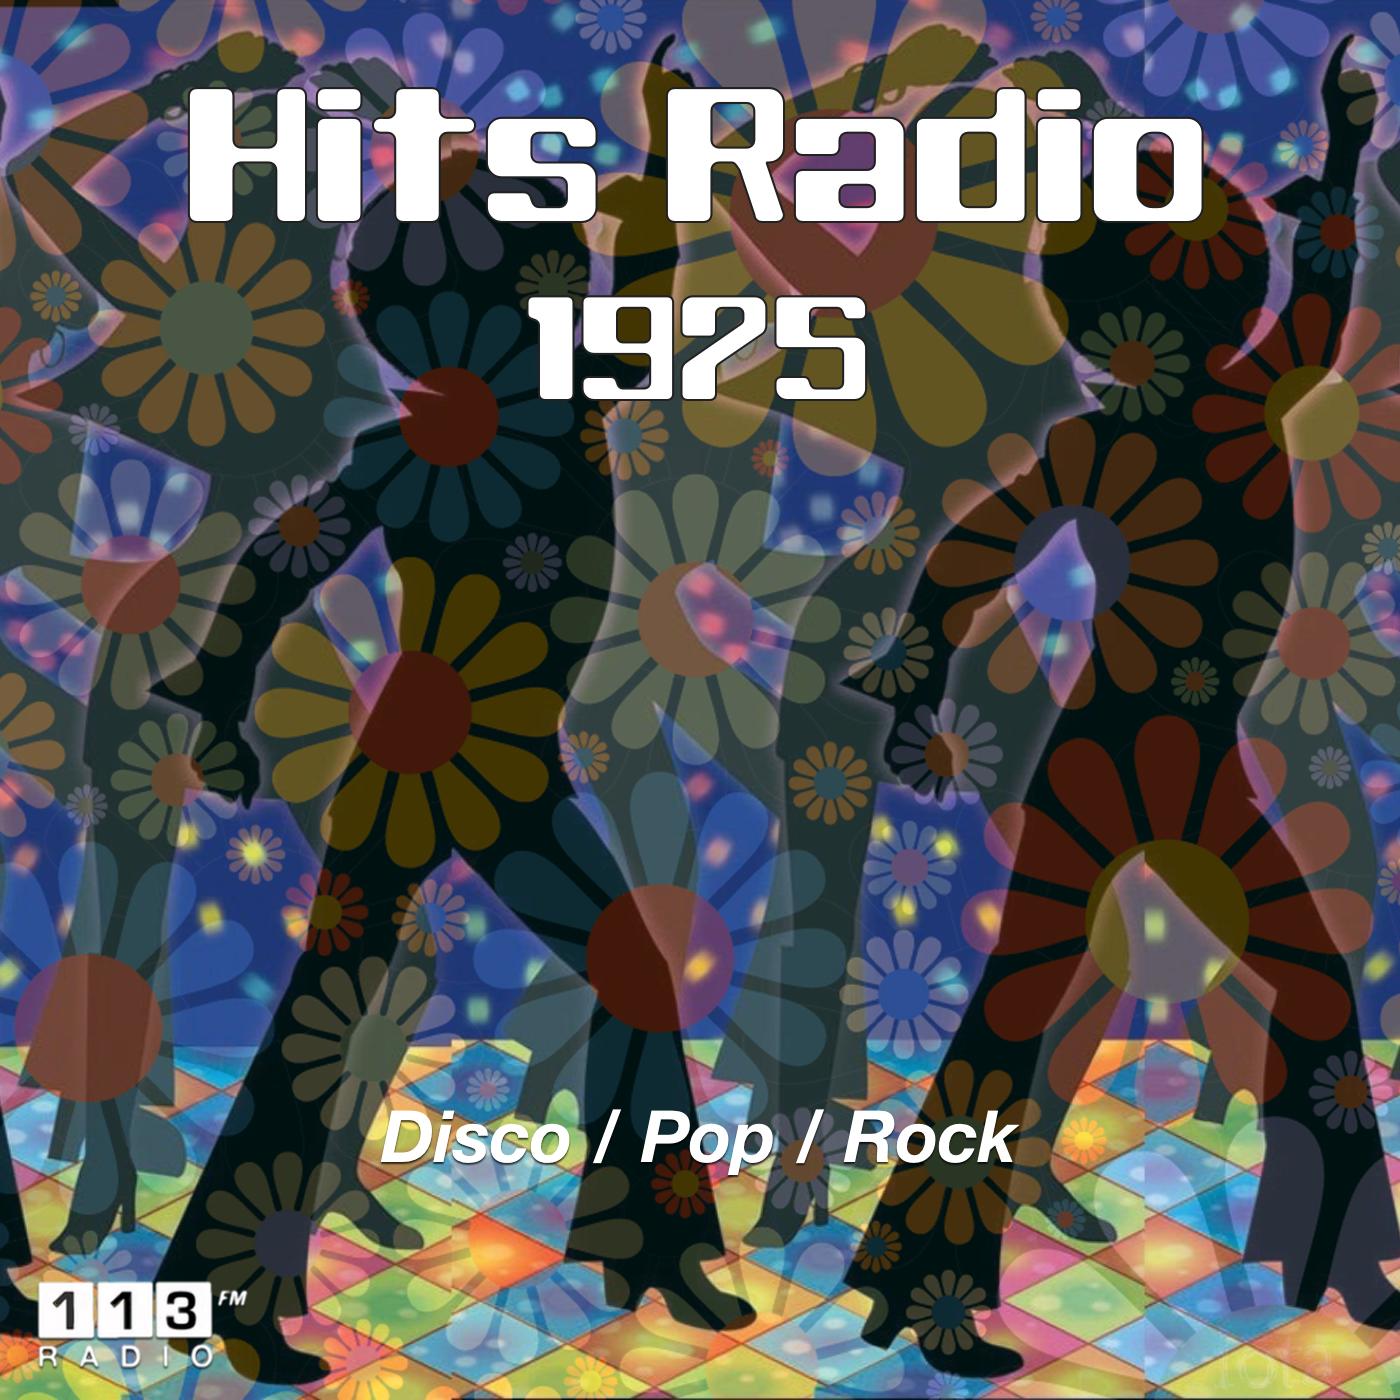 113.fm Hits Radio - 1975